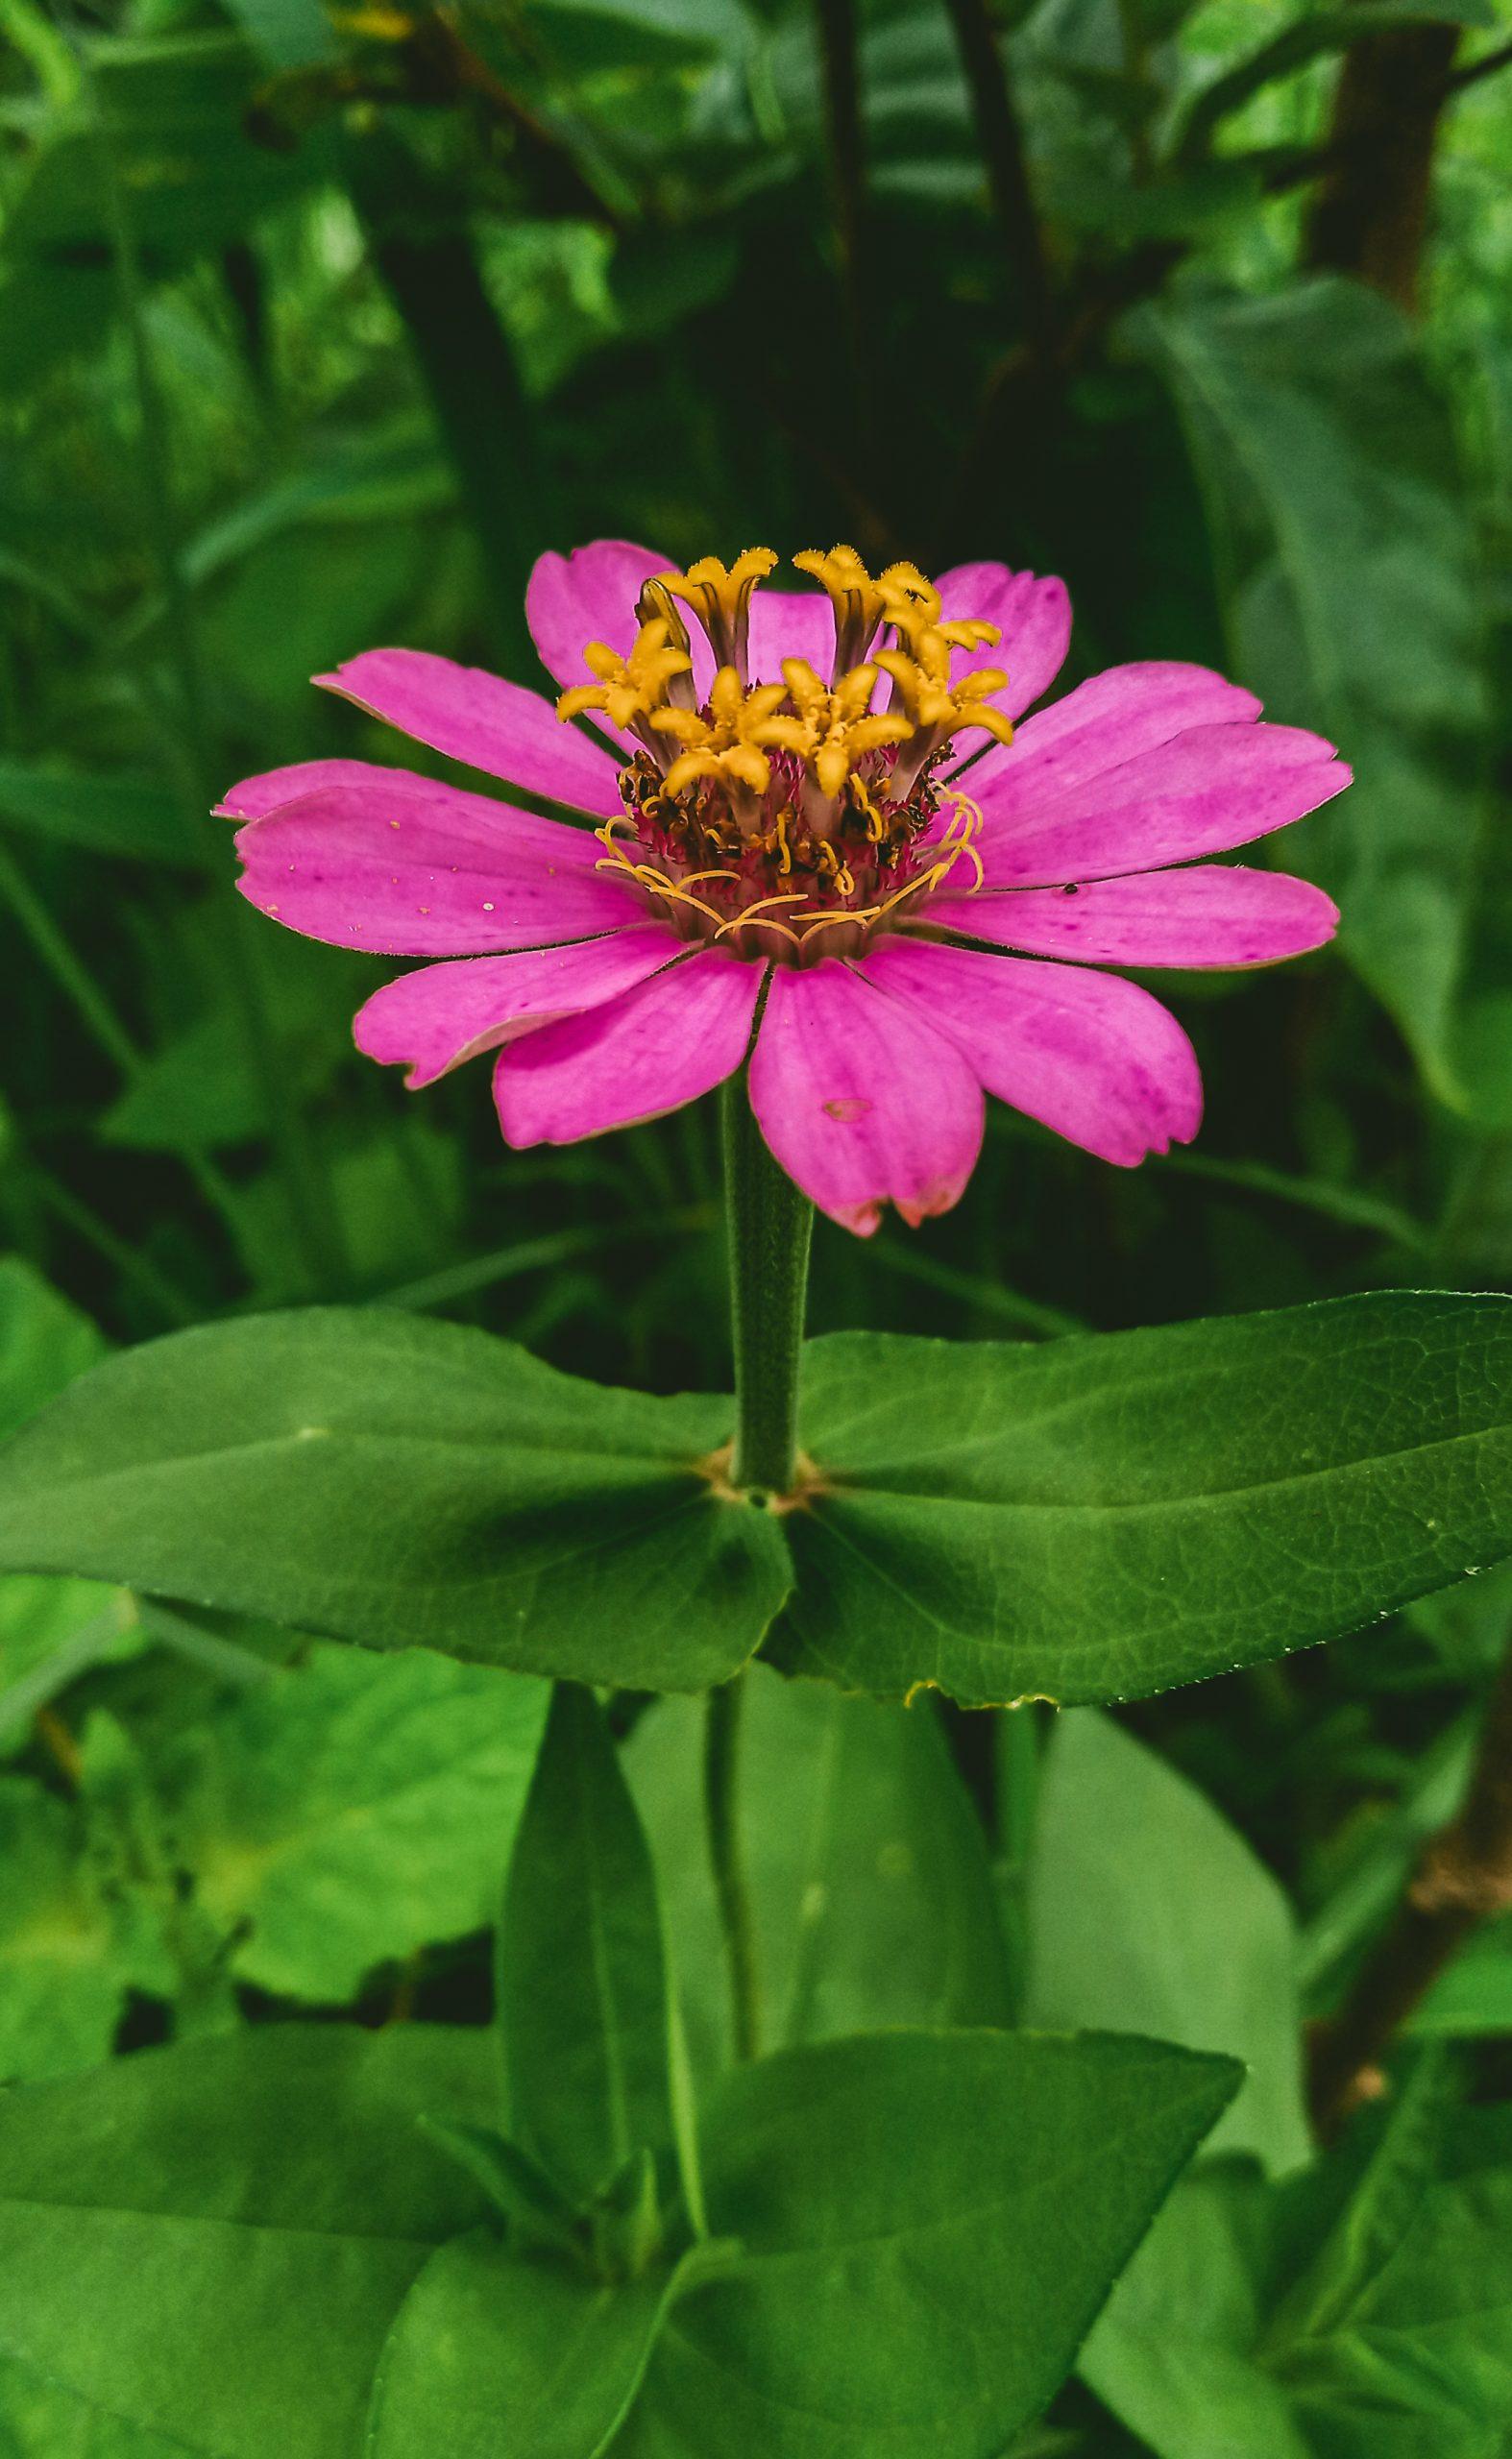 Pink coloured common zinnia